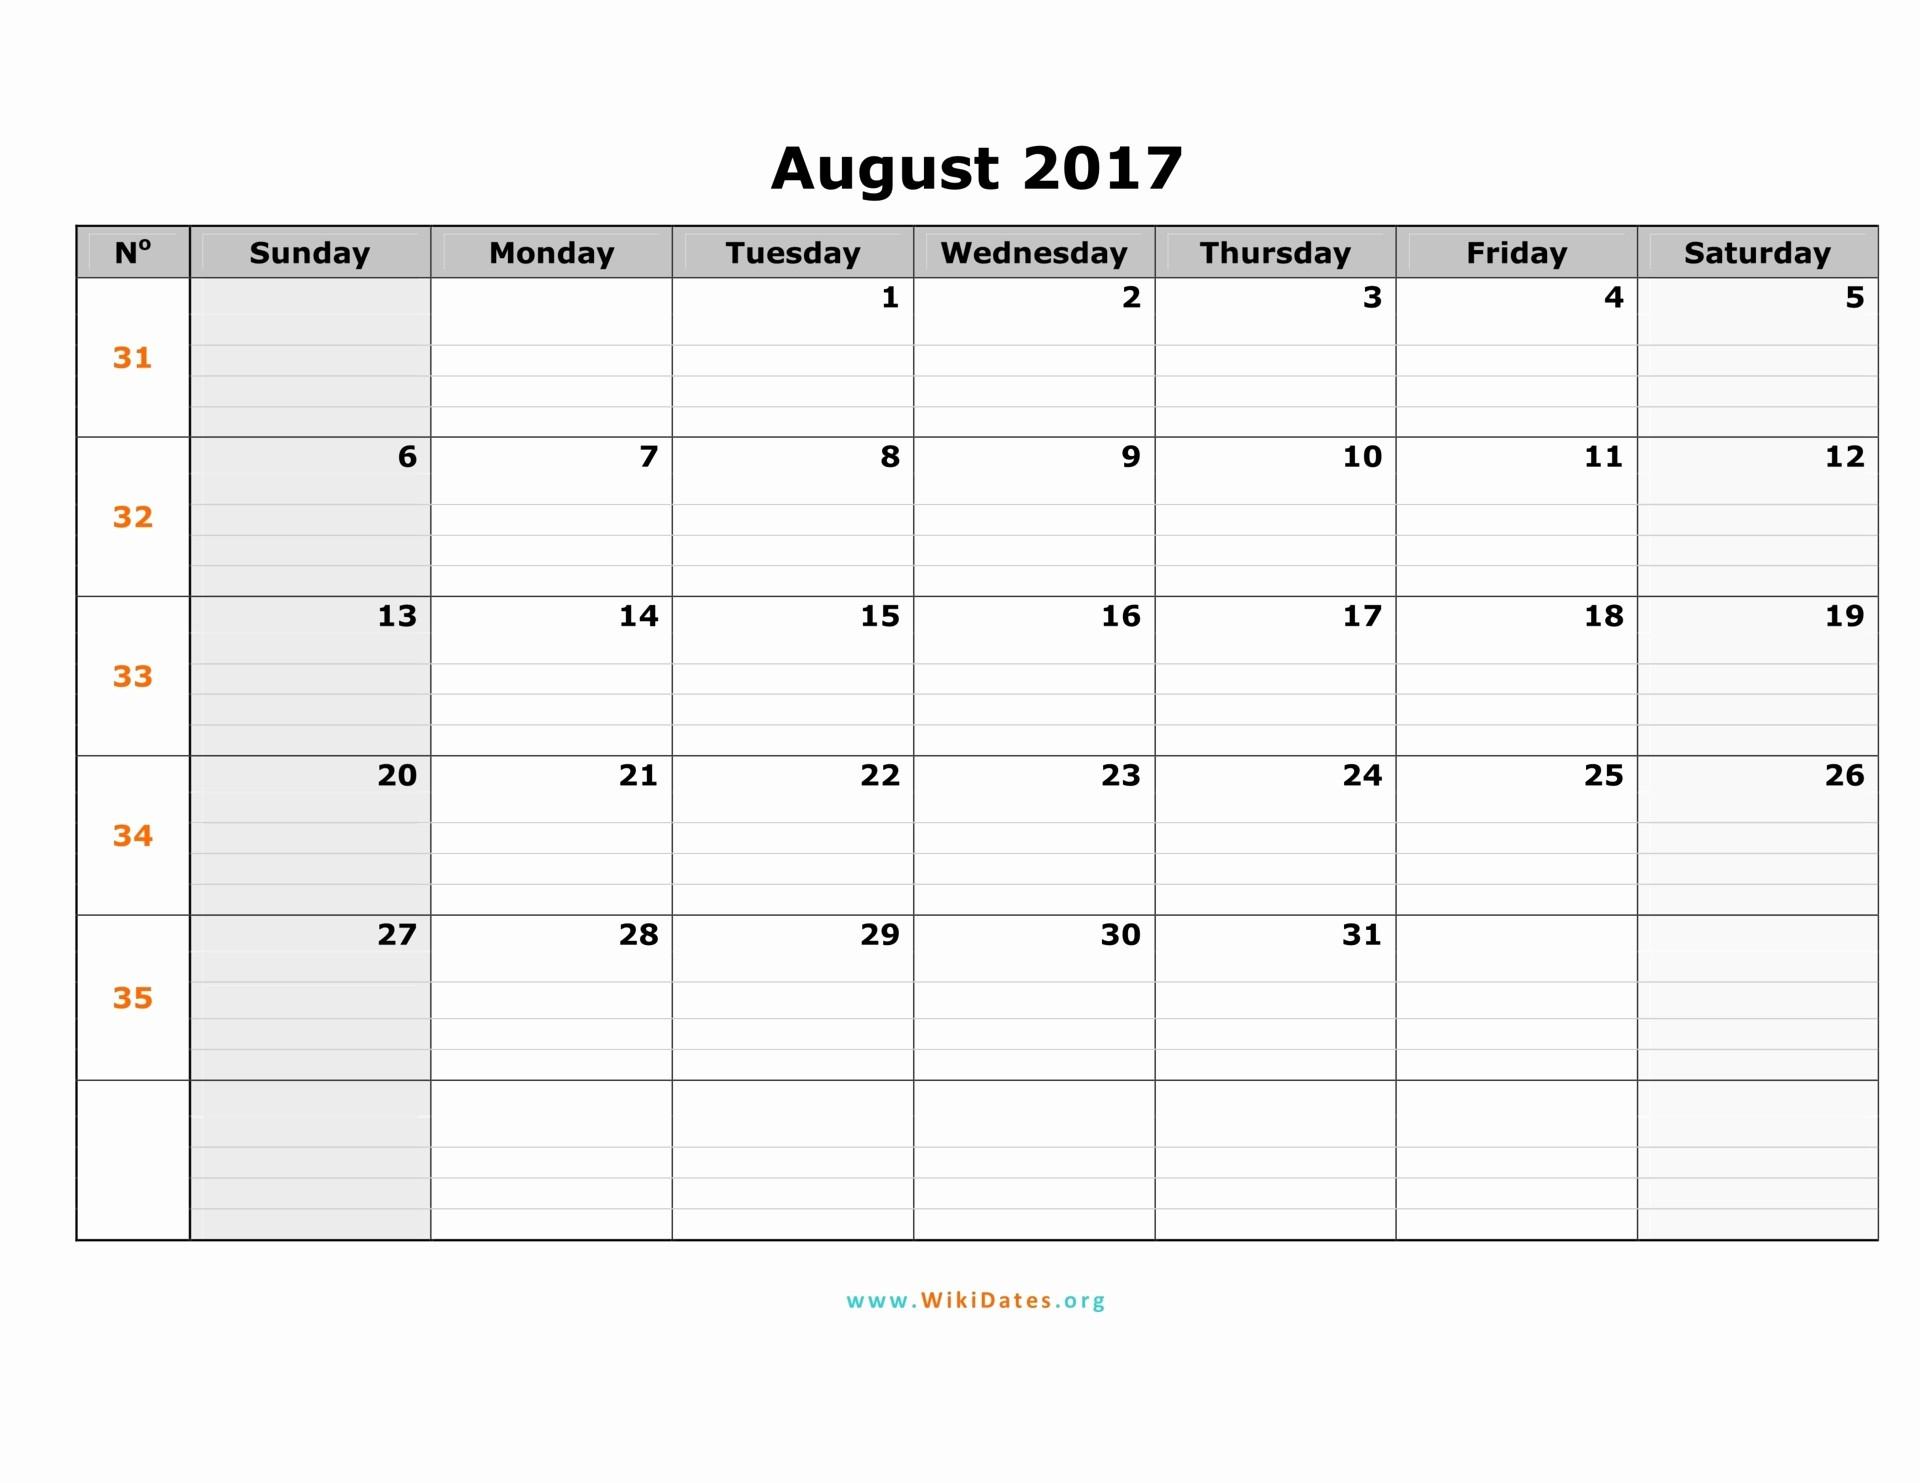 2017 Calendar Template Word Document Luxury August 2017 Calendar Word